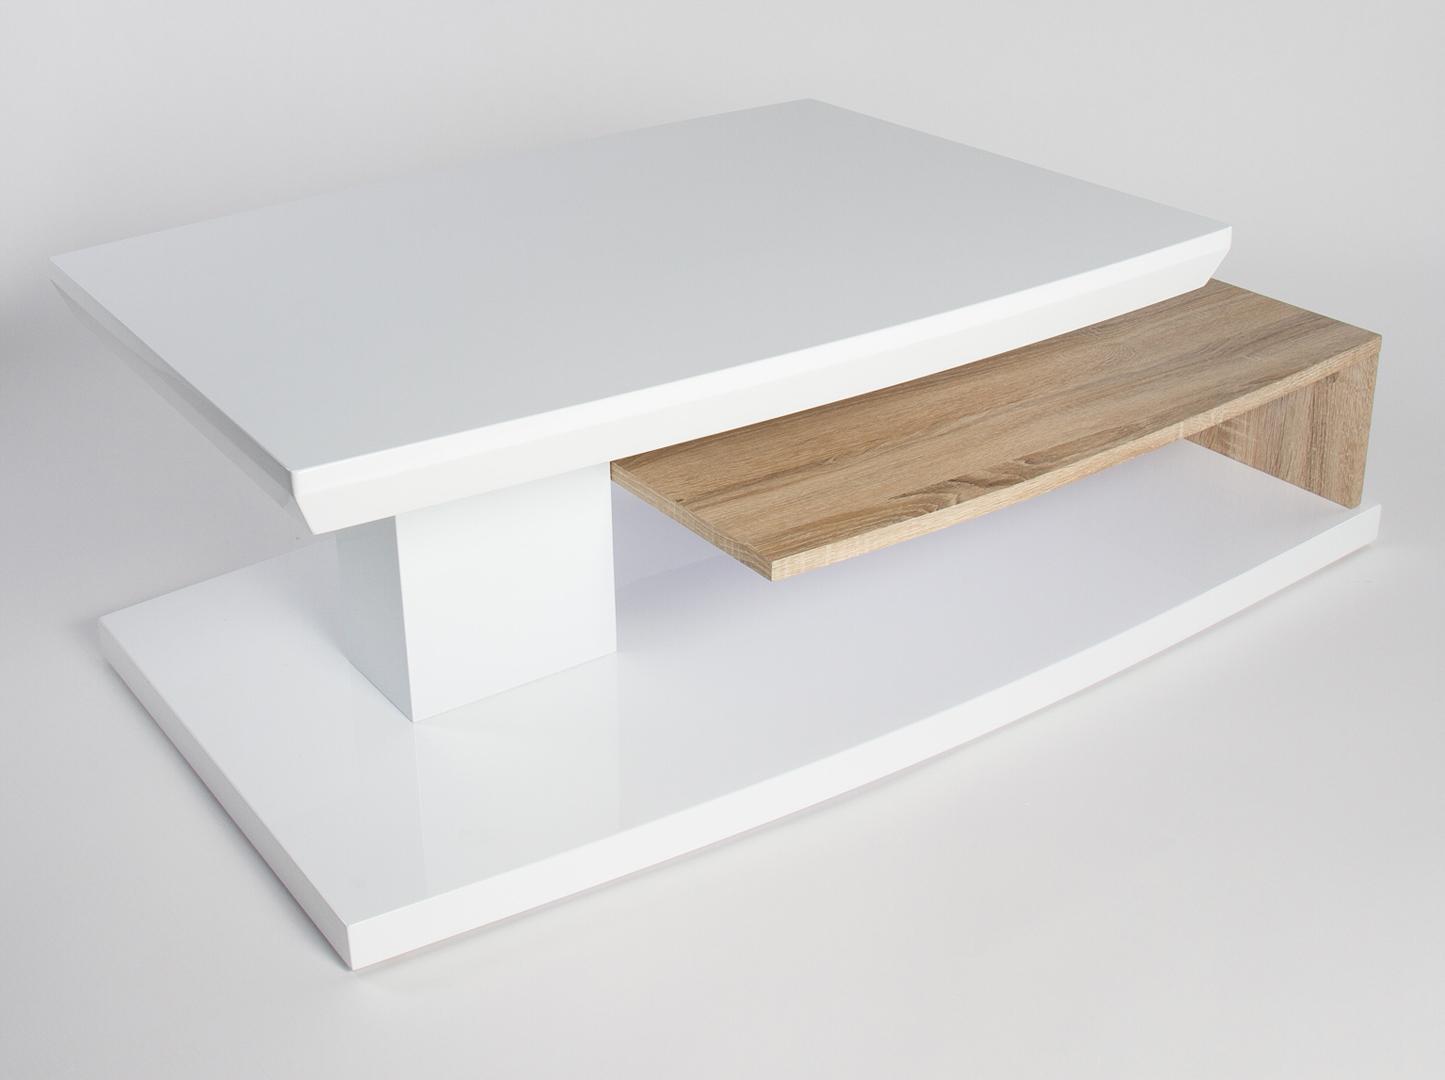 Table En Bois Chene Clair design bois laquéchêne basse table clair en blanc sulina